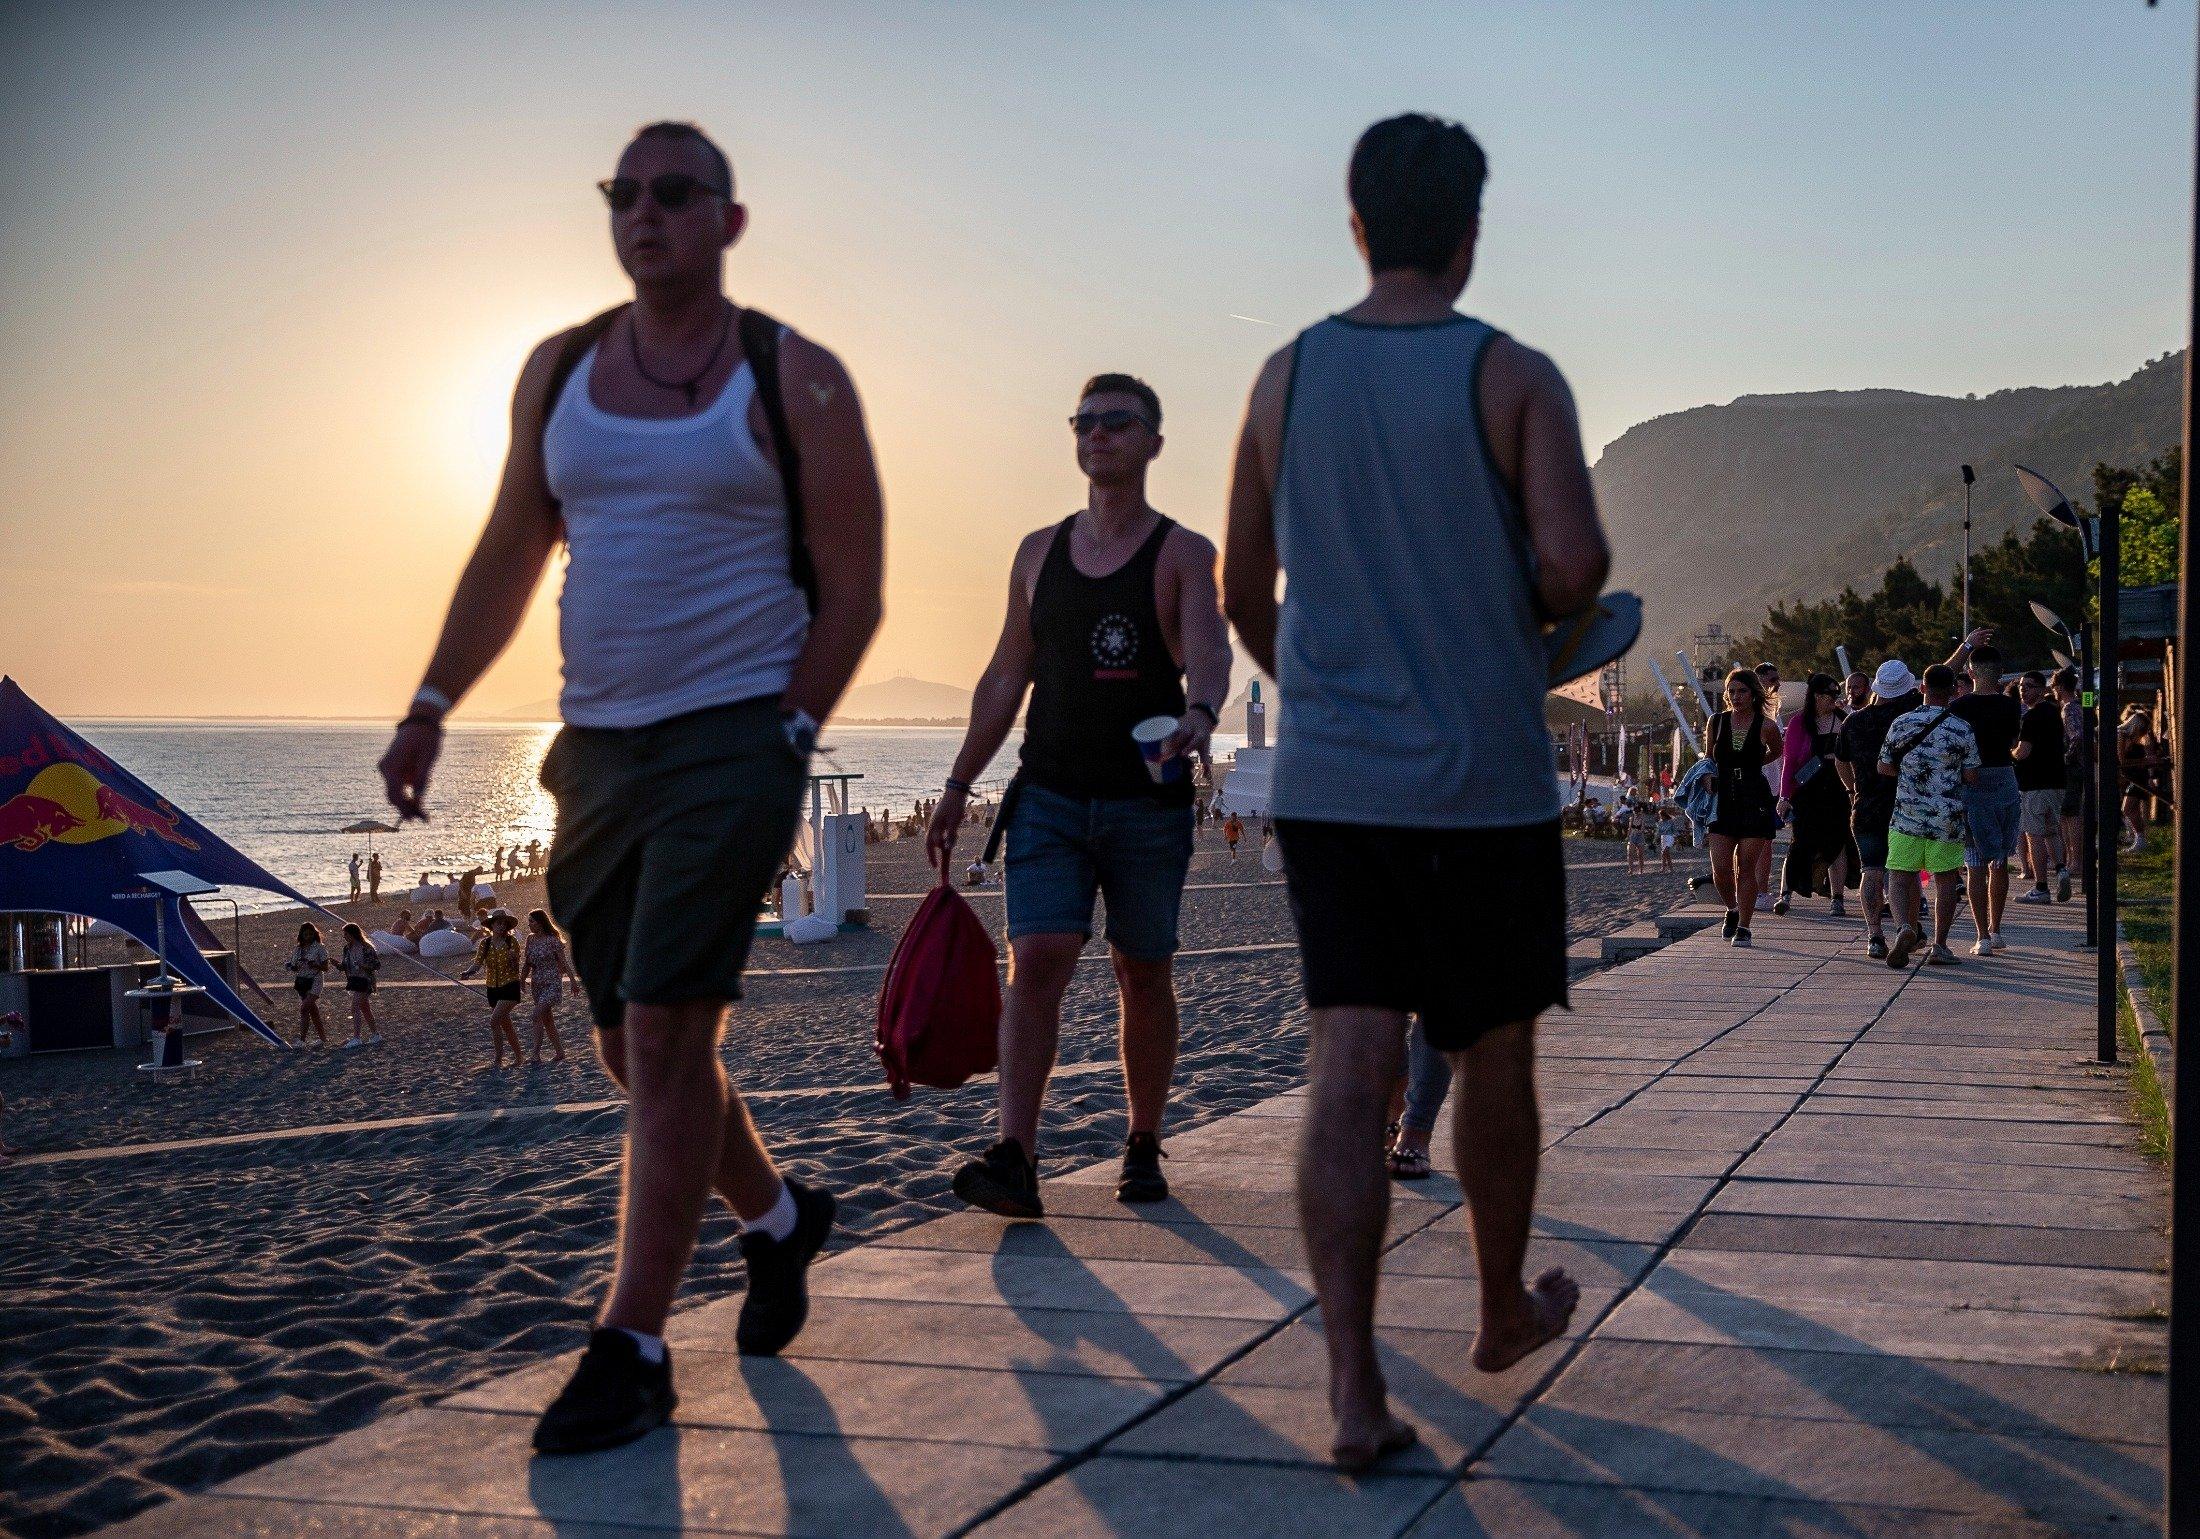 Virus-free international fans arrive at Unum Albania's open-air music festival in Shengjin, Albania, June 4, 2021. (AP Photo)